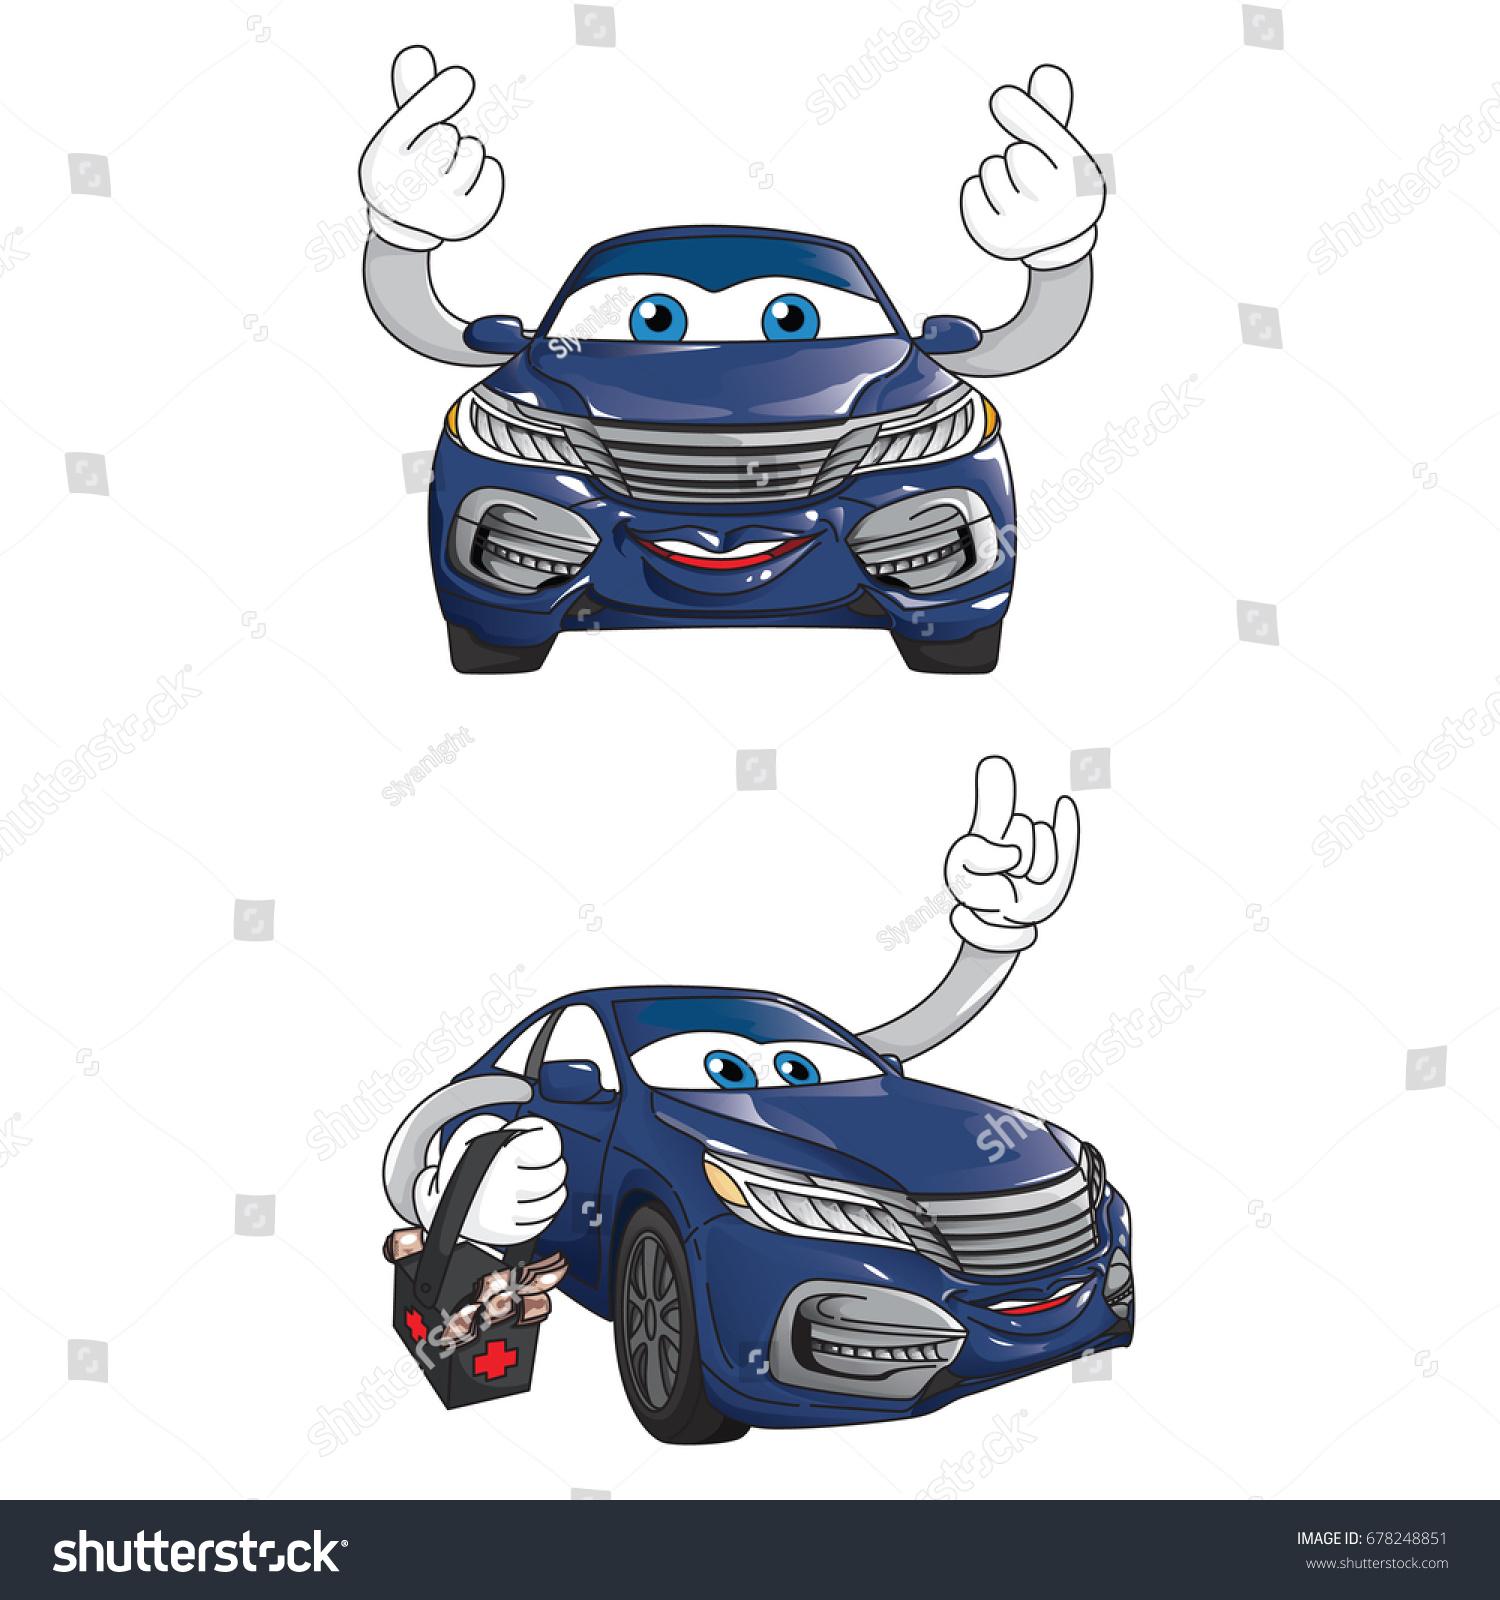 Car Mascot Character Design Vehicle Cartoon Stock Vector 678248851